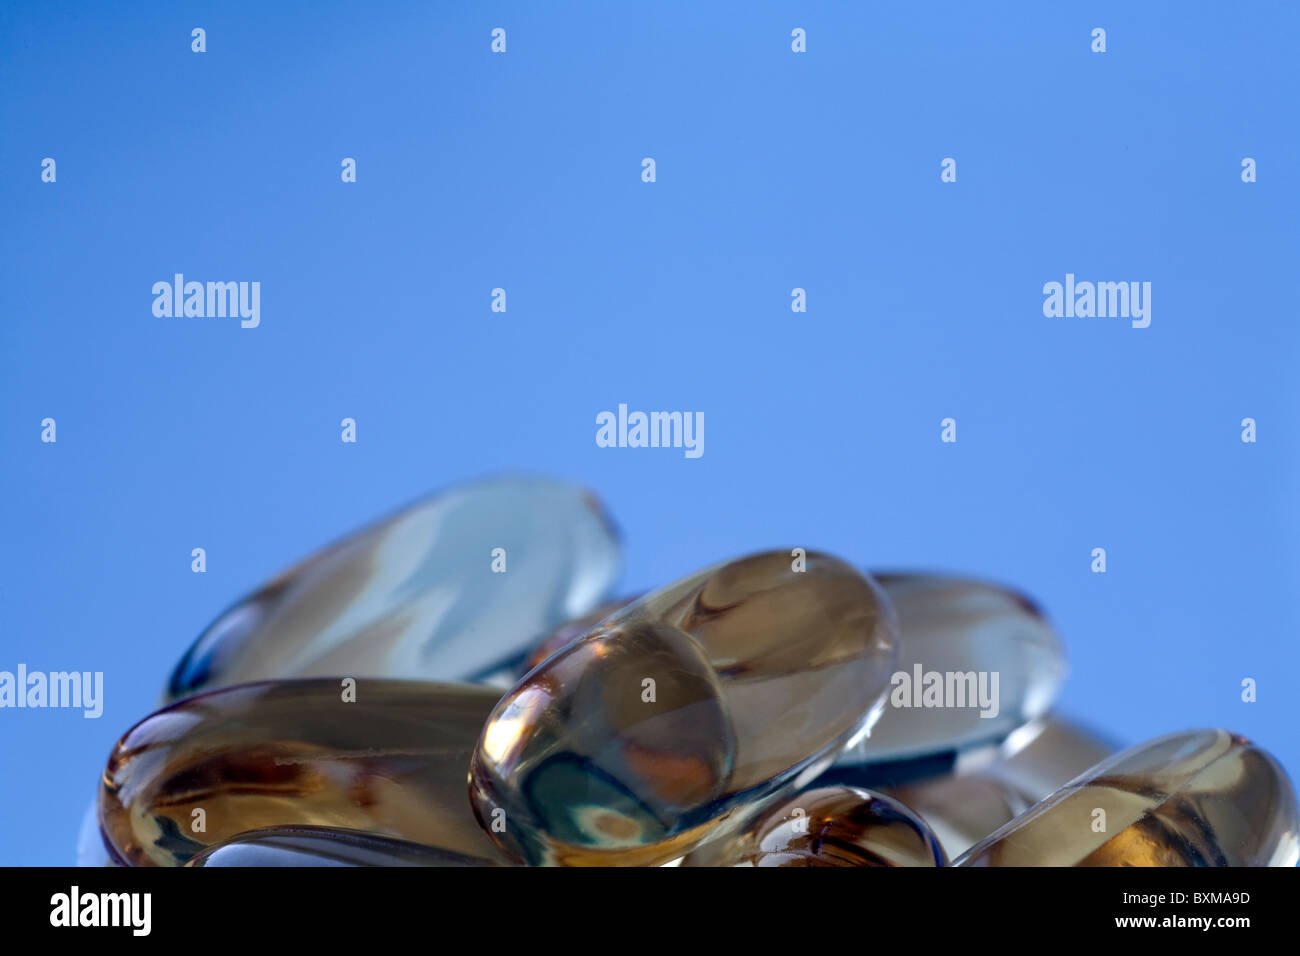 Cod liver oil capsules - Stock Image